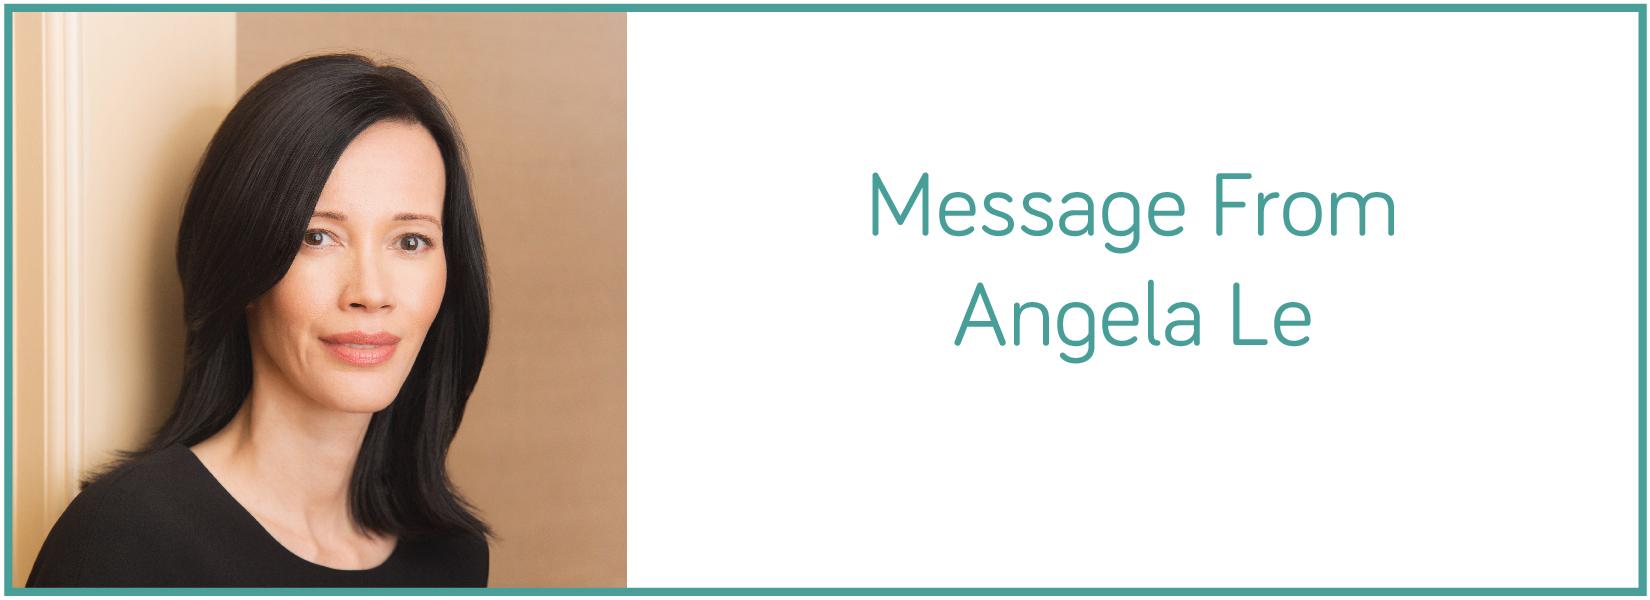 Message from Angela Le Final Web Final v2-01.jpg